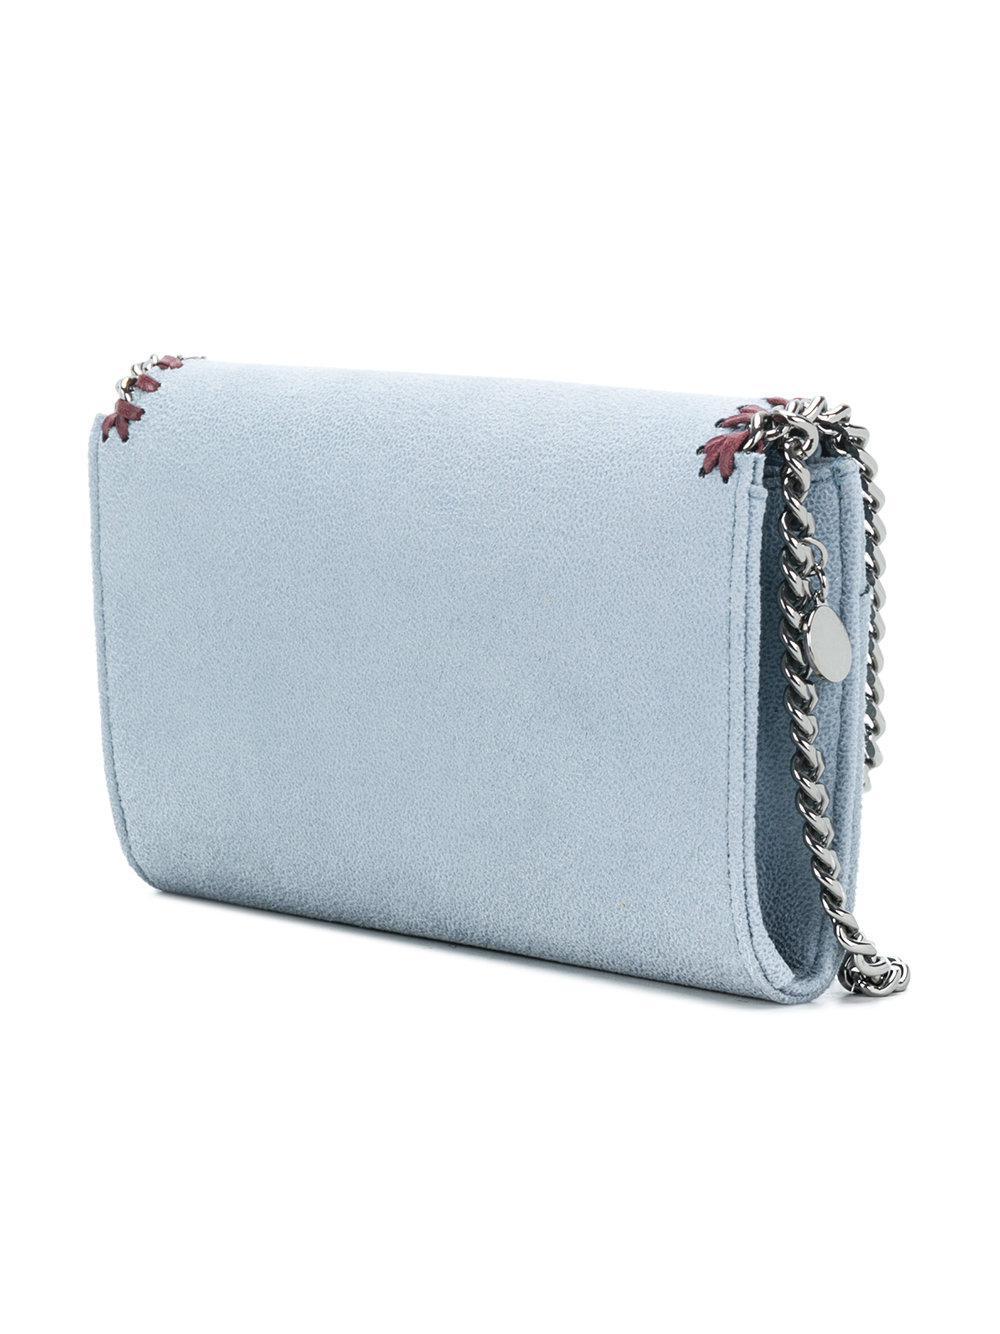 Stella McCartney Falabella Cross Body Bag in Blue